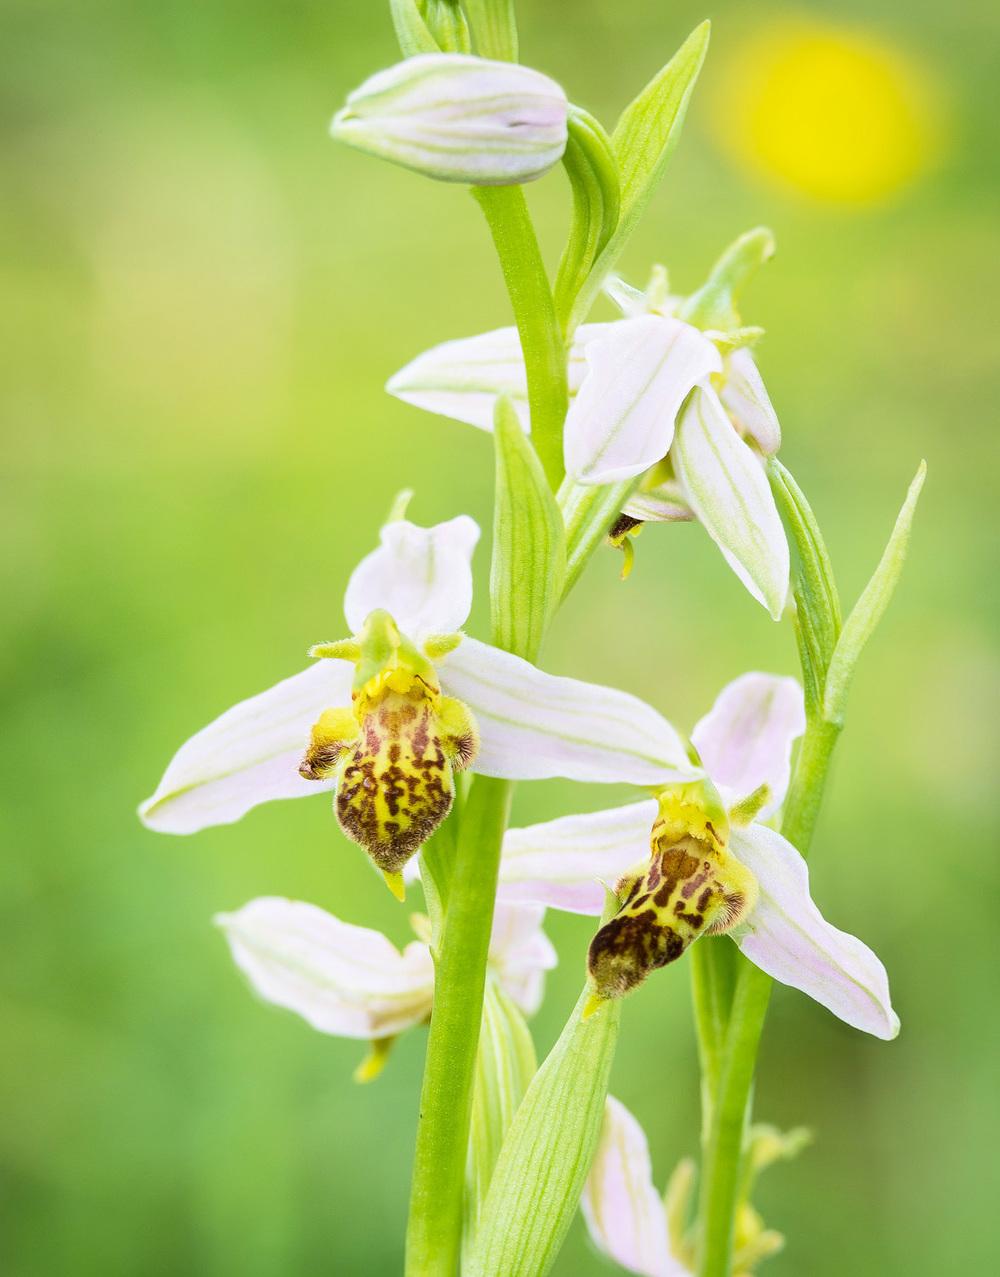 Ophrys apifera var. trollii